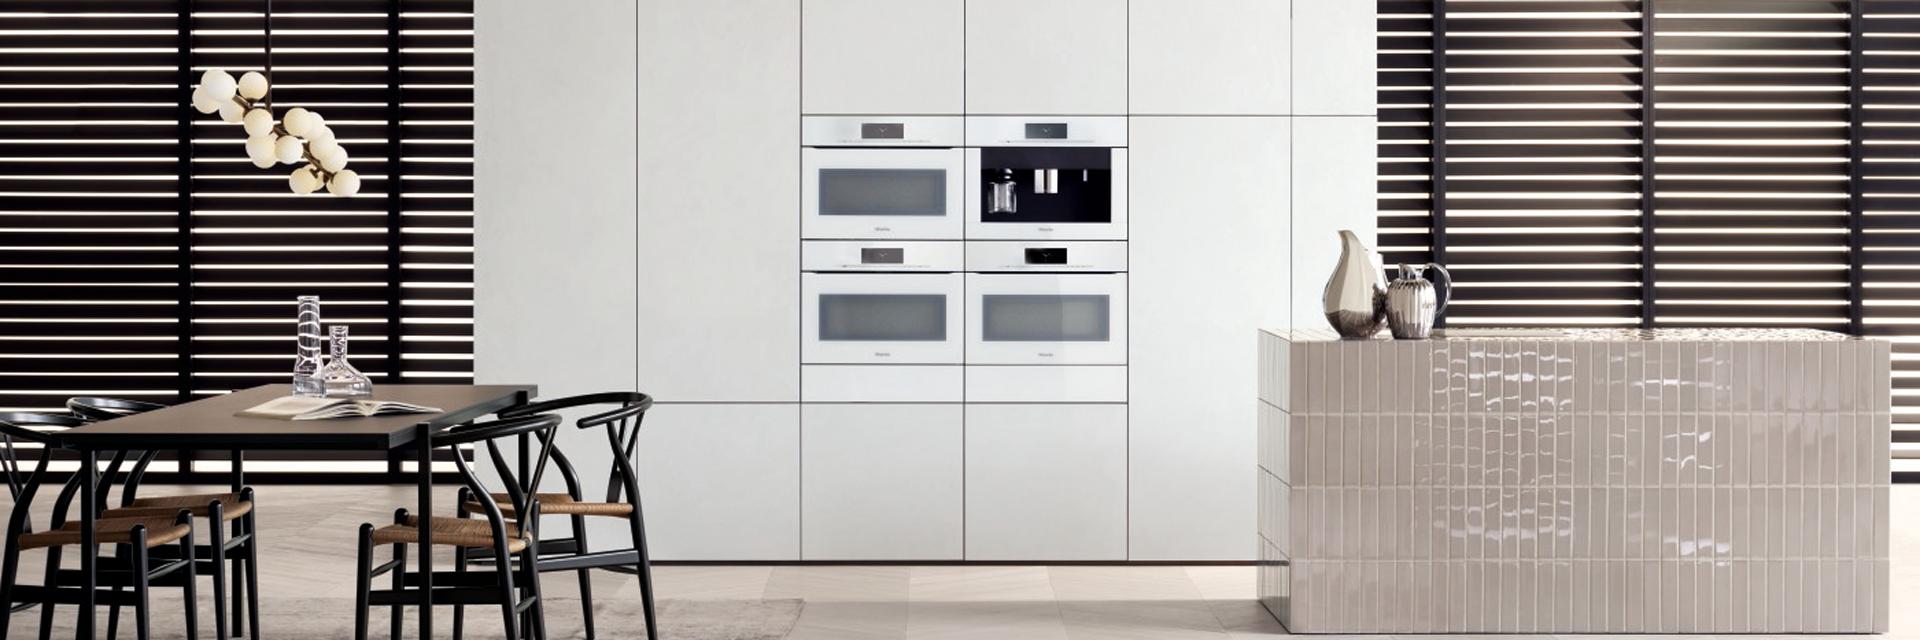 Sous-vide keuken | Eigenhuis Keukens